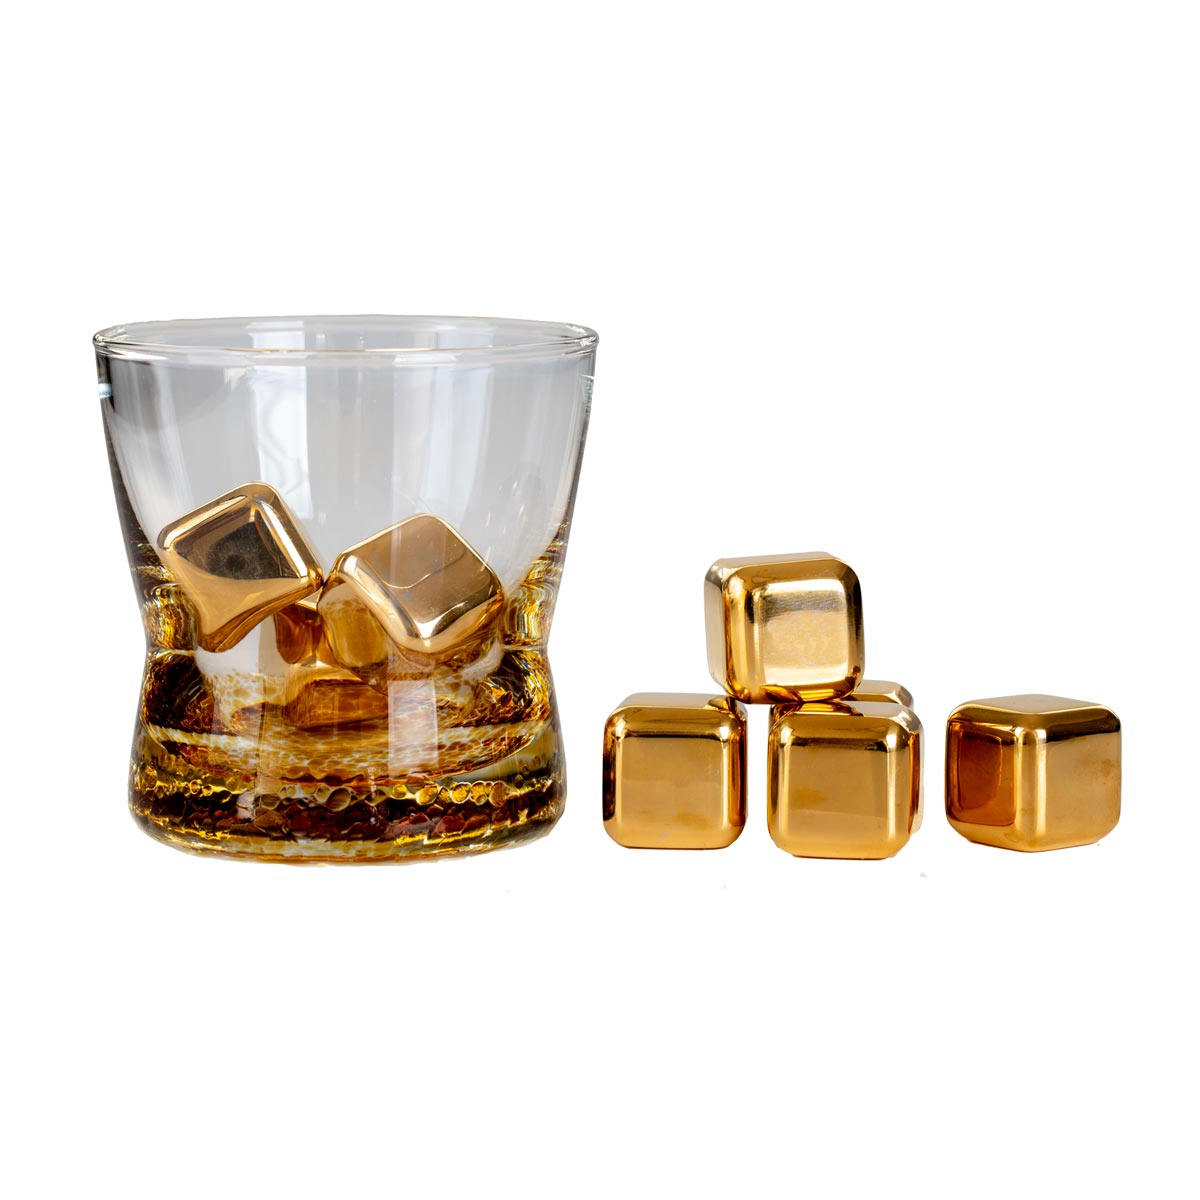 Elite Luxury 24K Gold Whisky Stones